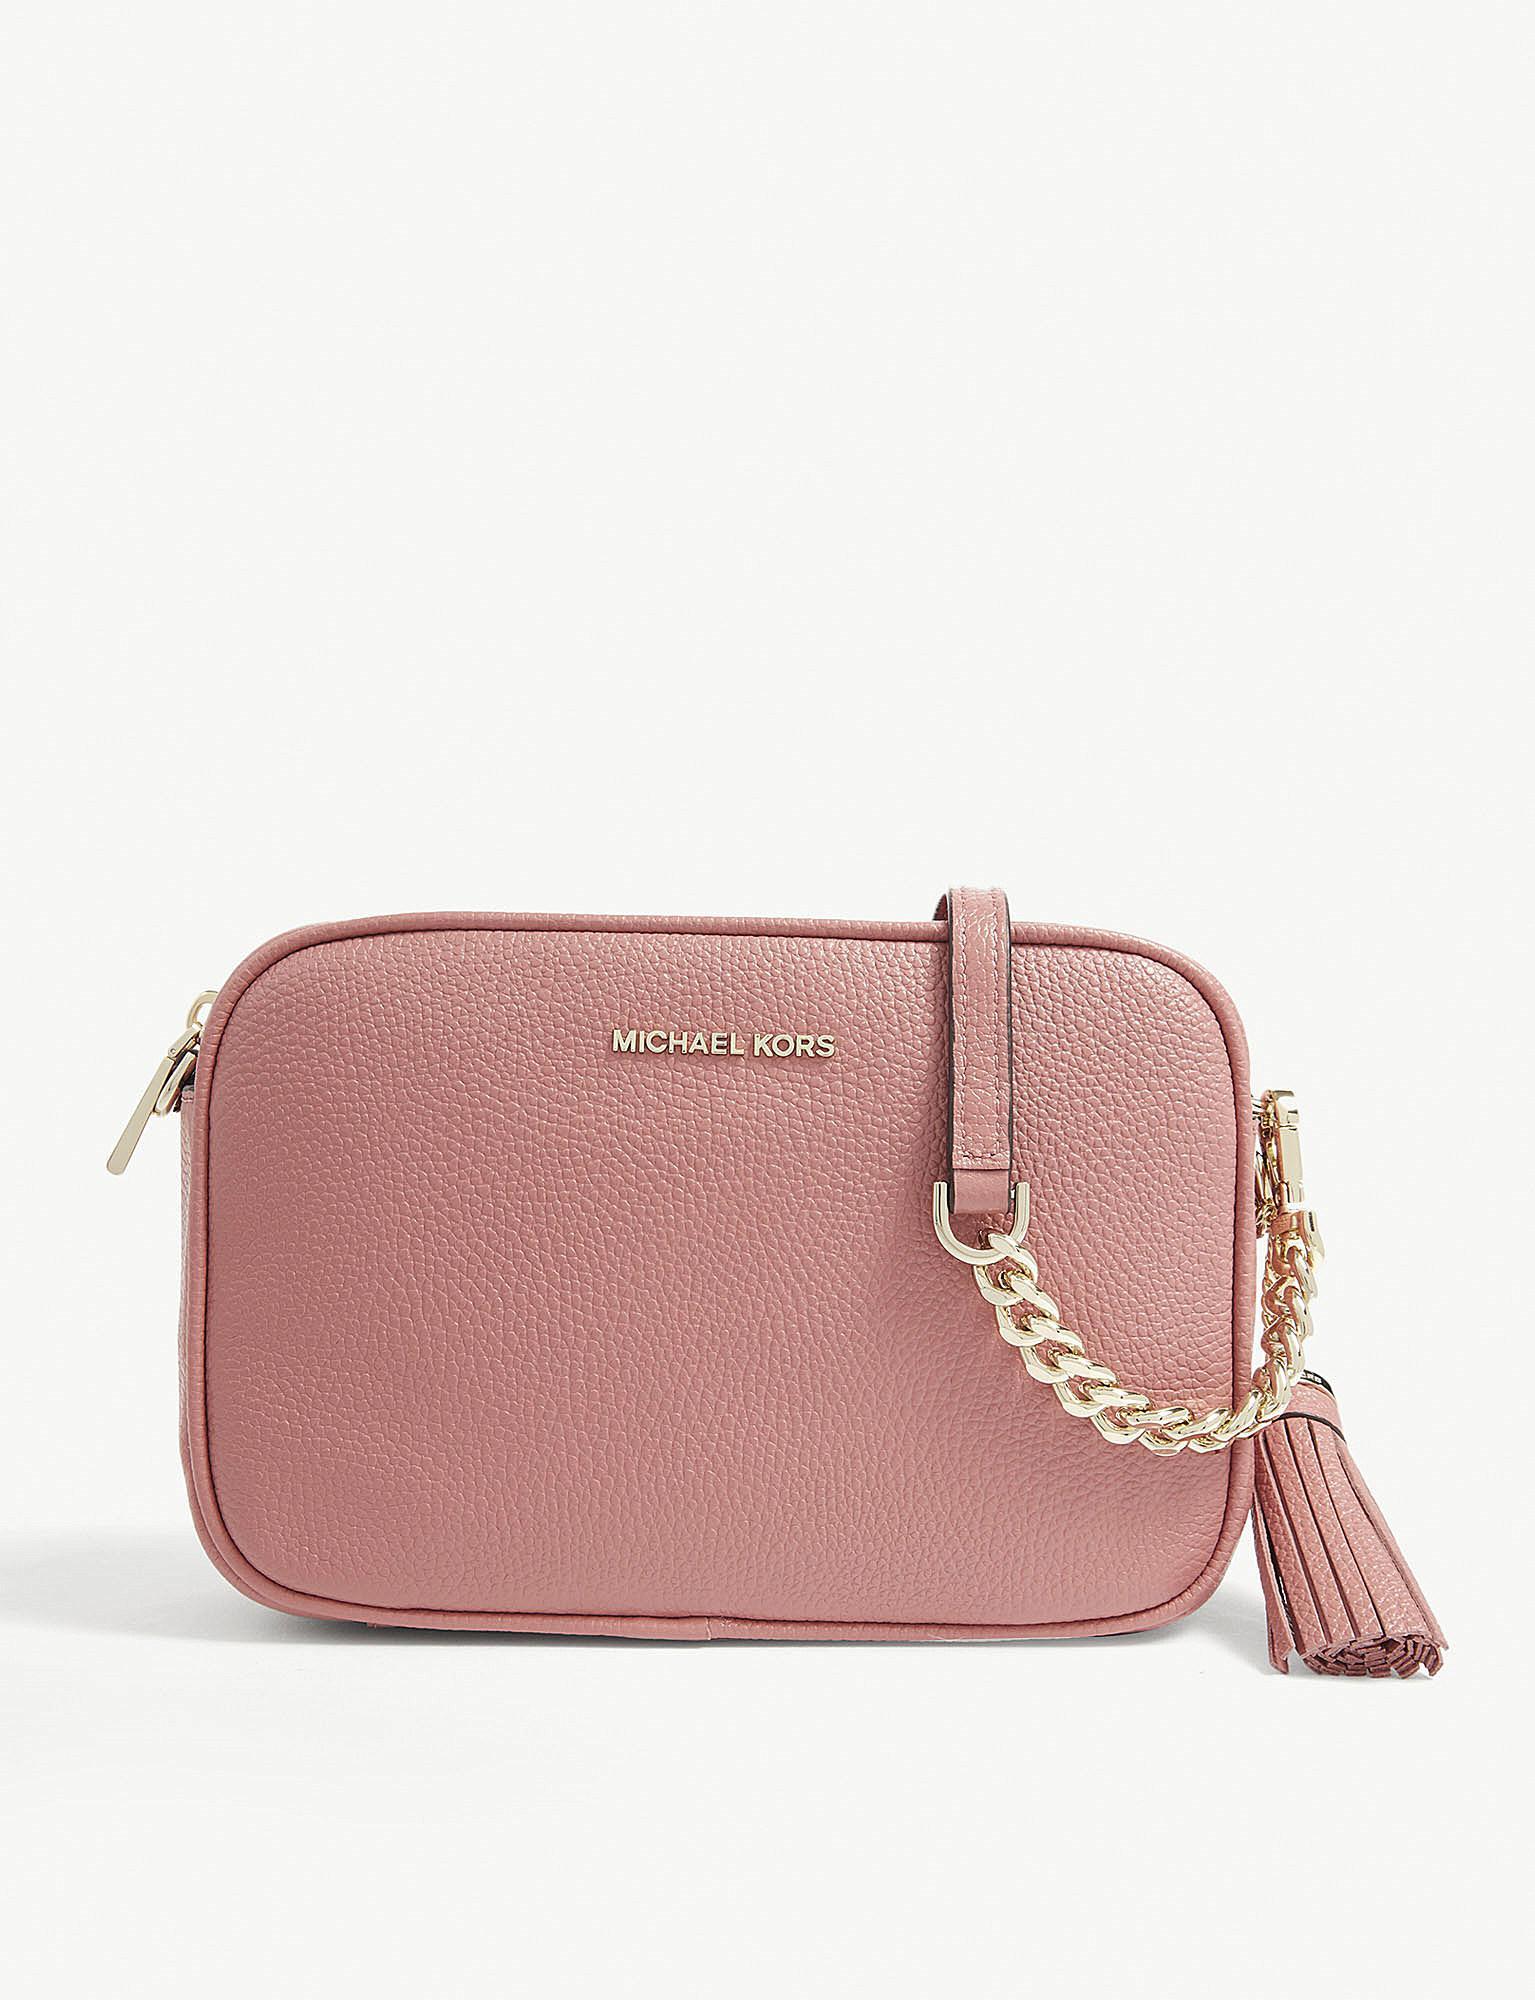 144d6667eec35 MICHAEL Michael Kors Ginny Leather Cross-body Bag in Pink - Lyst